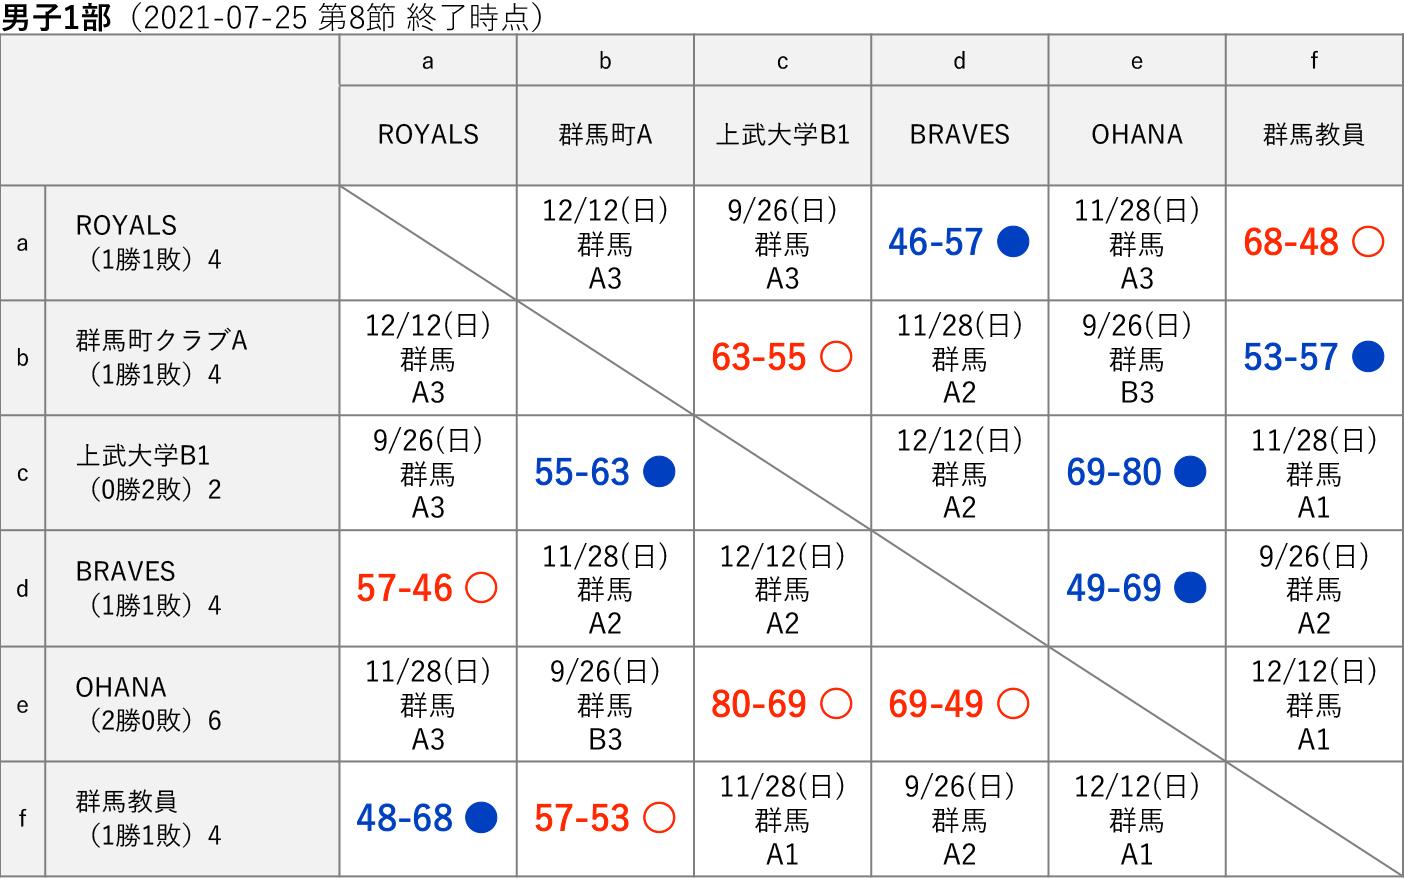 2021社会人リーグ 男子1部 星取り表(2021-07-25 第8節終了時)